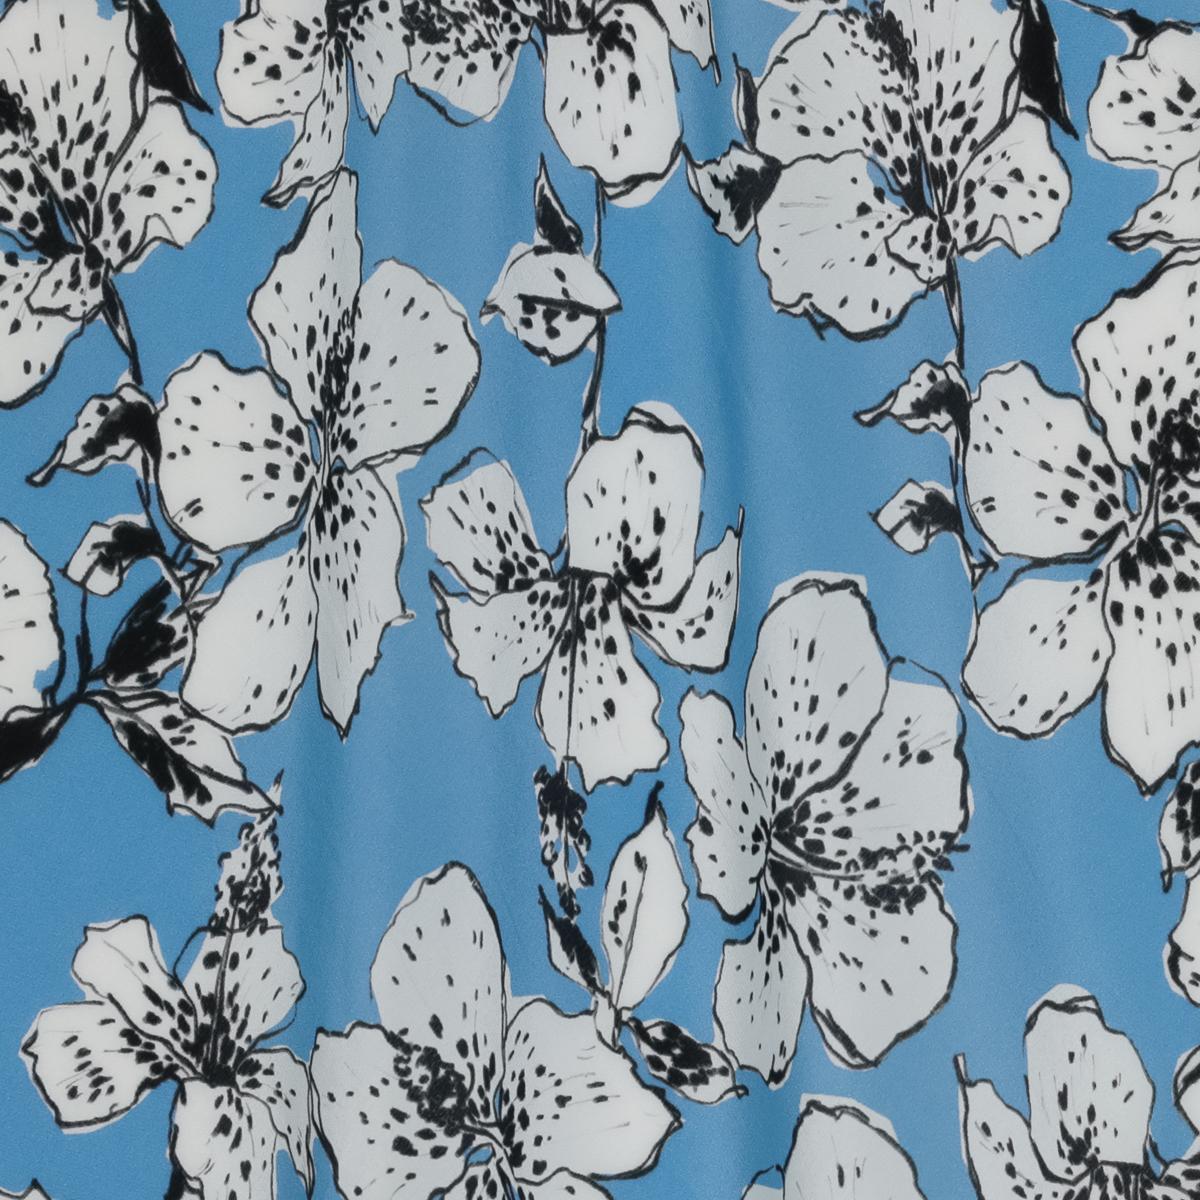 Шёлковый крепдешин с цветами гибискуса на фоне неба